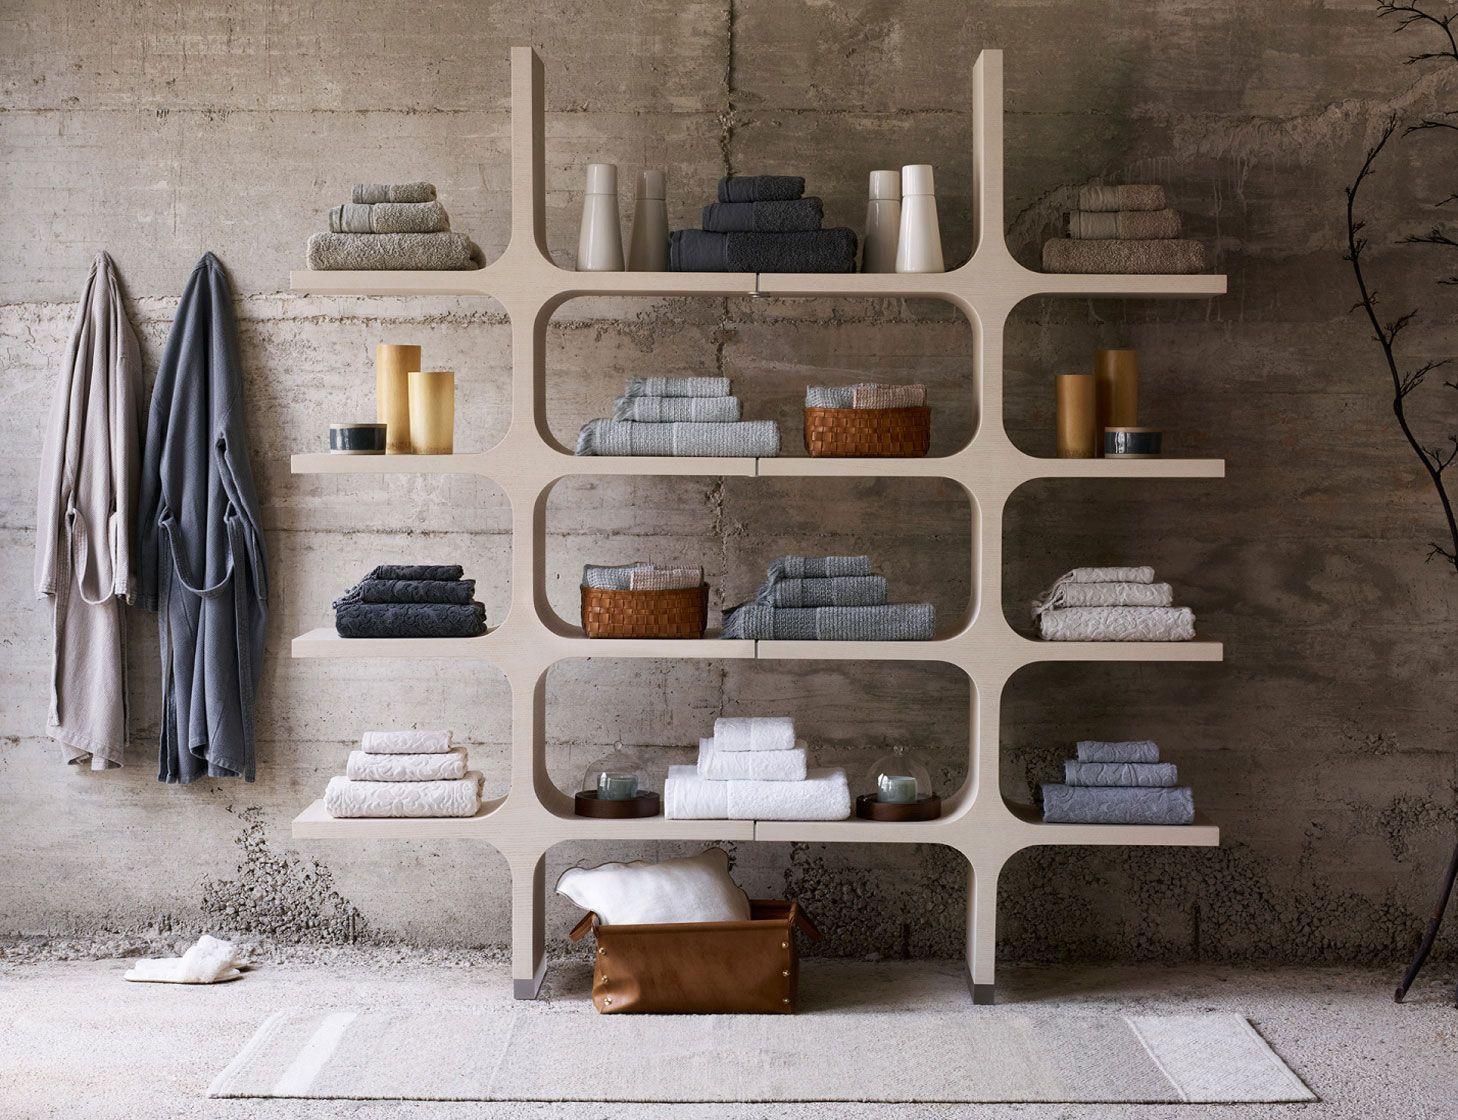 catalogue edit 2 linen campagne ah16 zara home. Black Bedroom Furniture Sets. Home Design Ideas